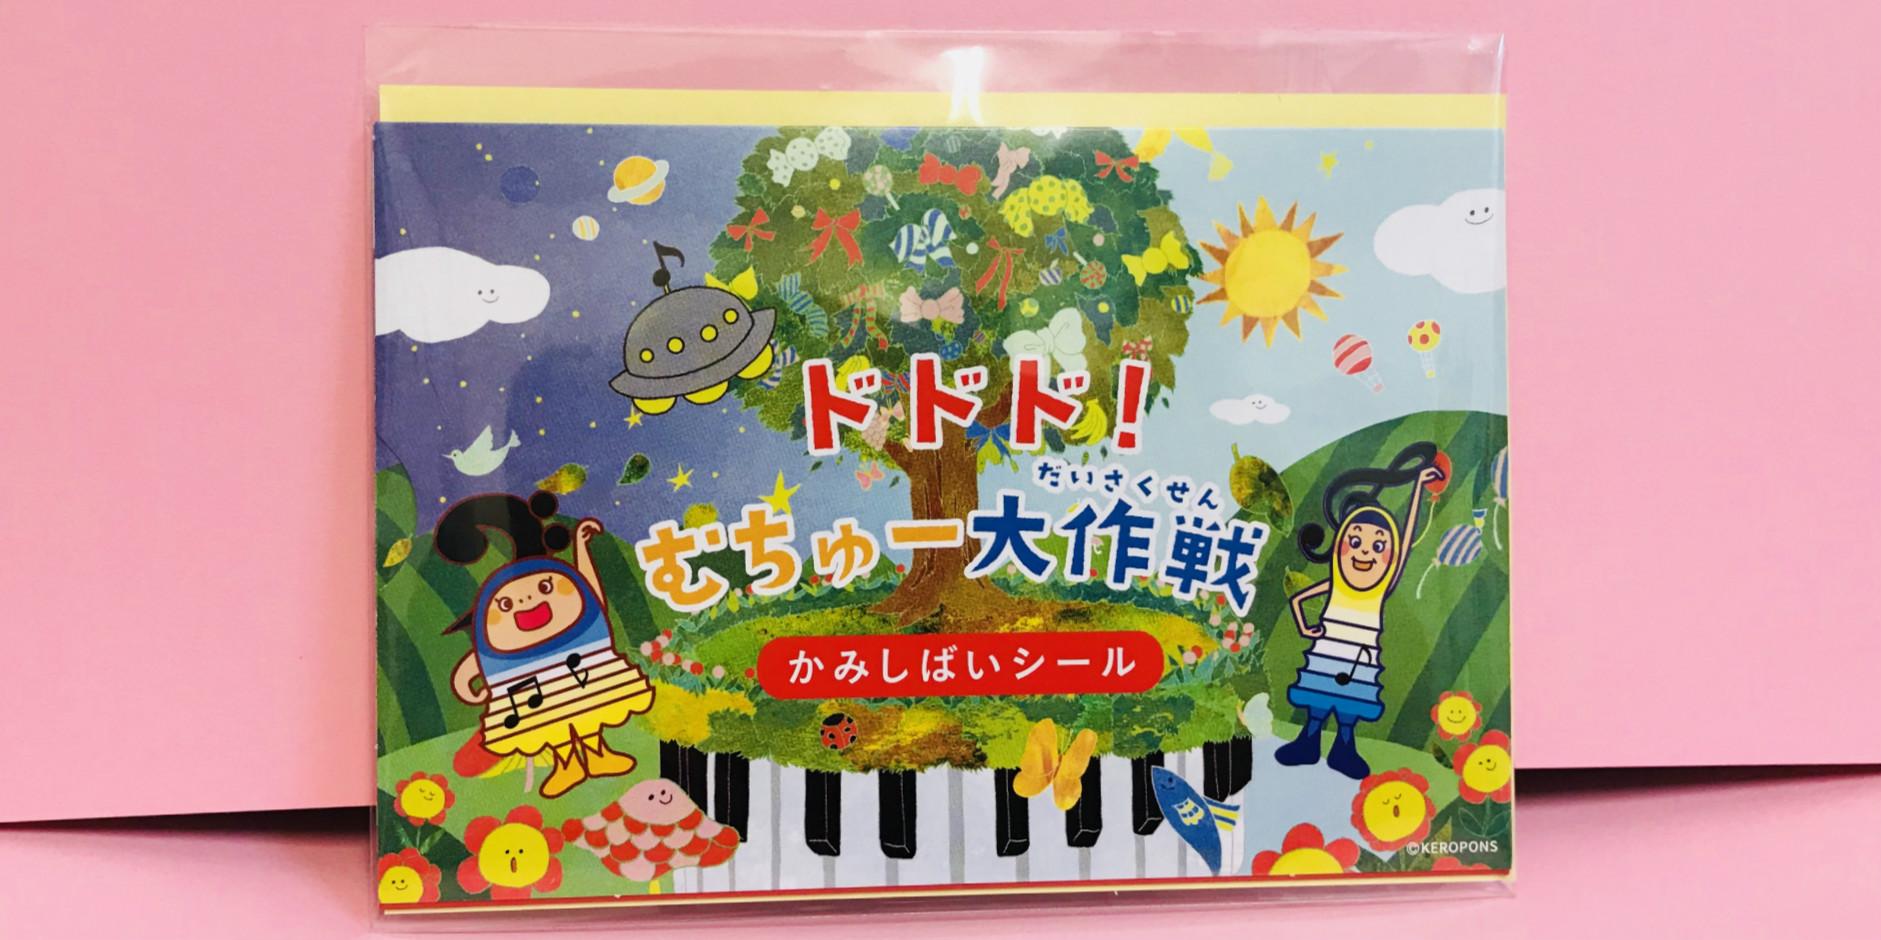 http://www.sumiya-goody.co.jp/shopblog/annex/keropons.jpg